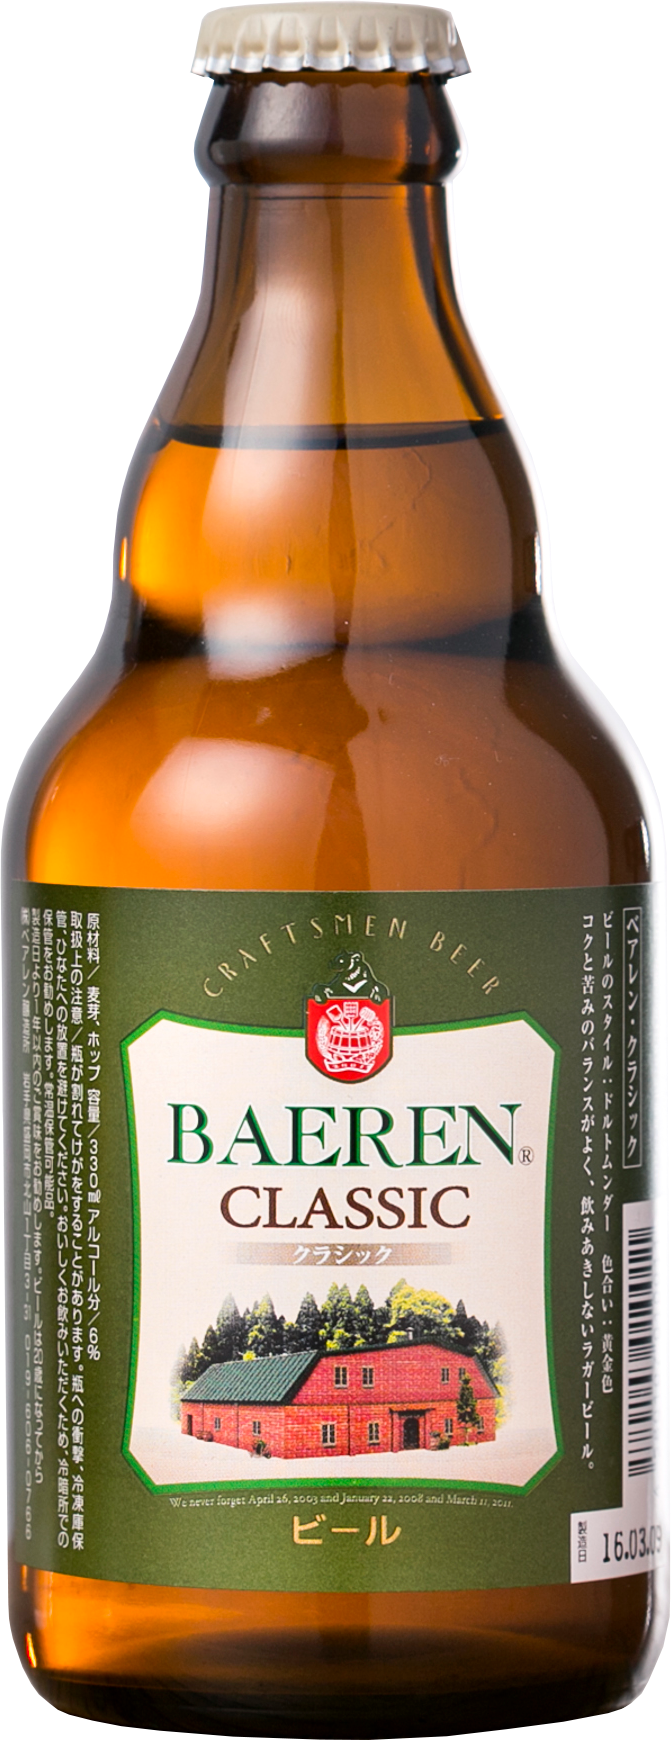 Baeren Classic クラシック.png